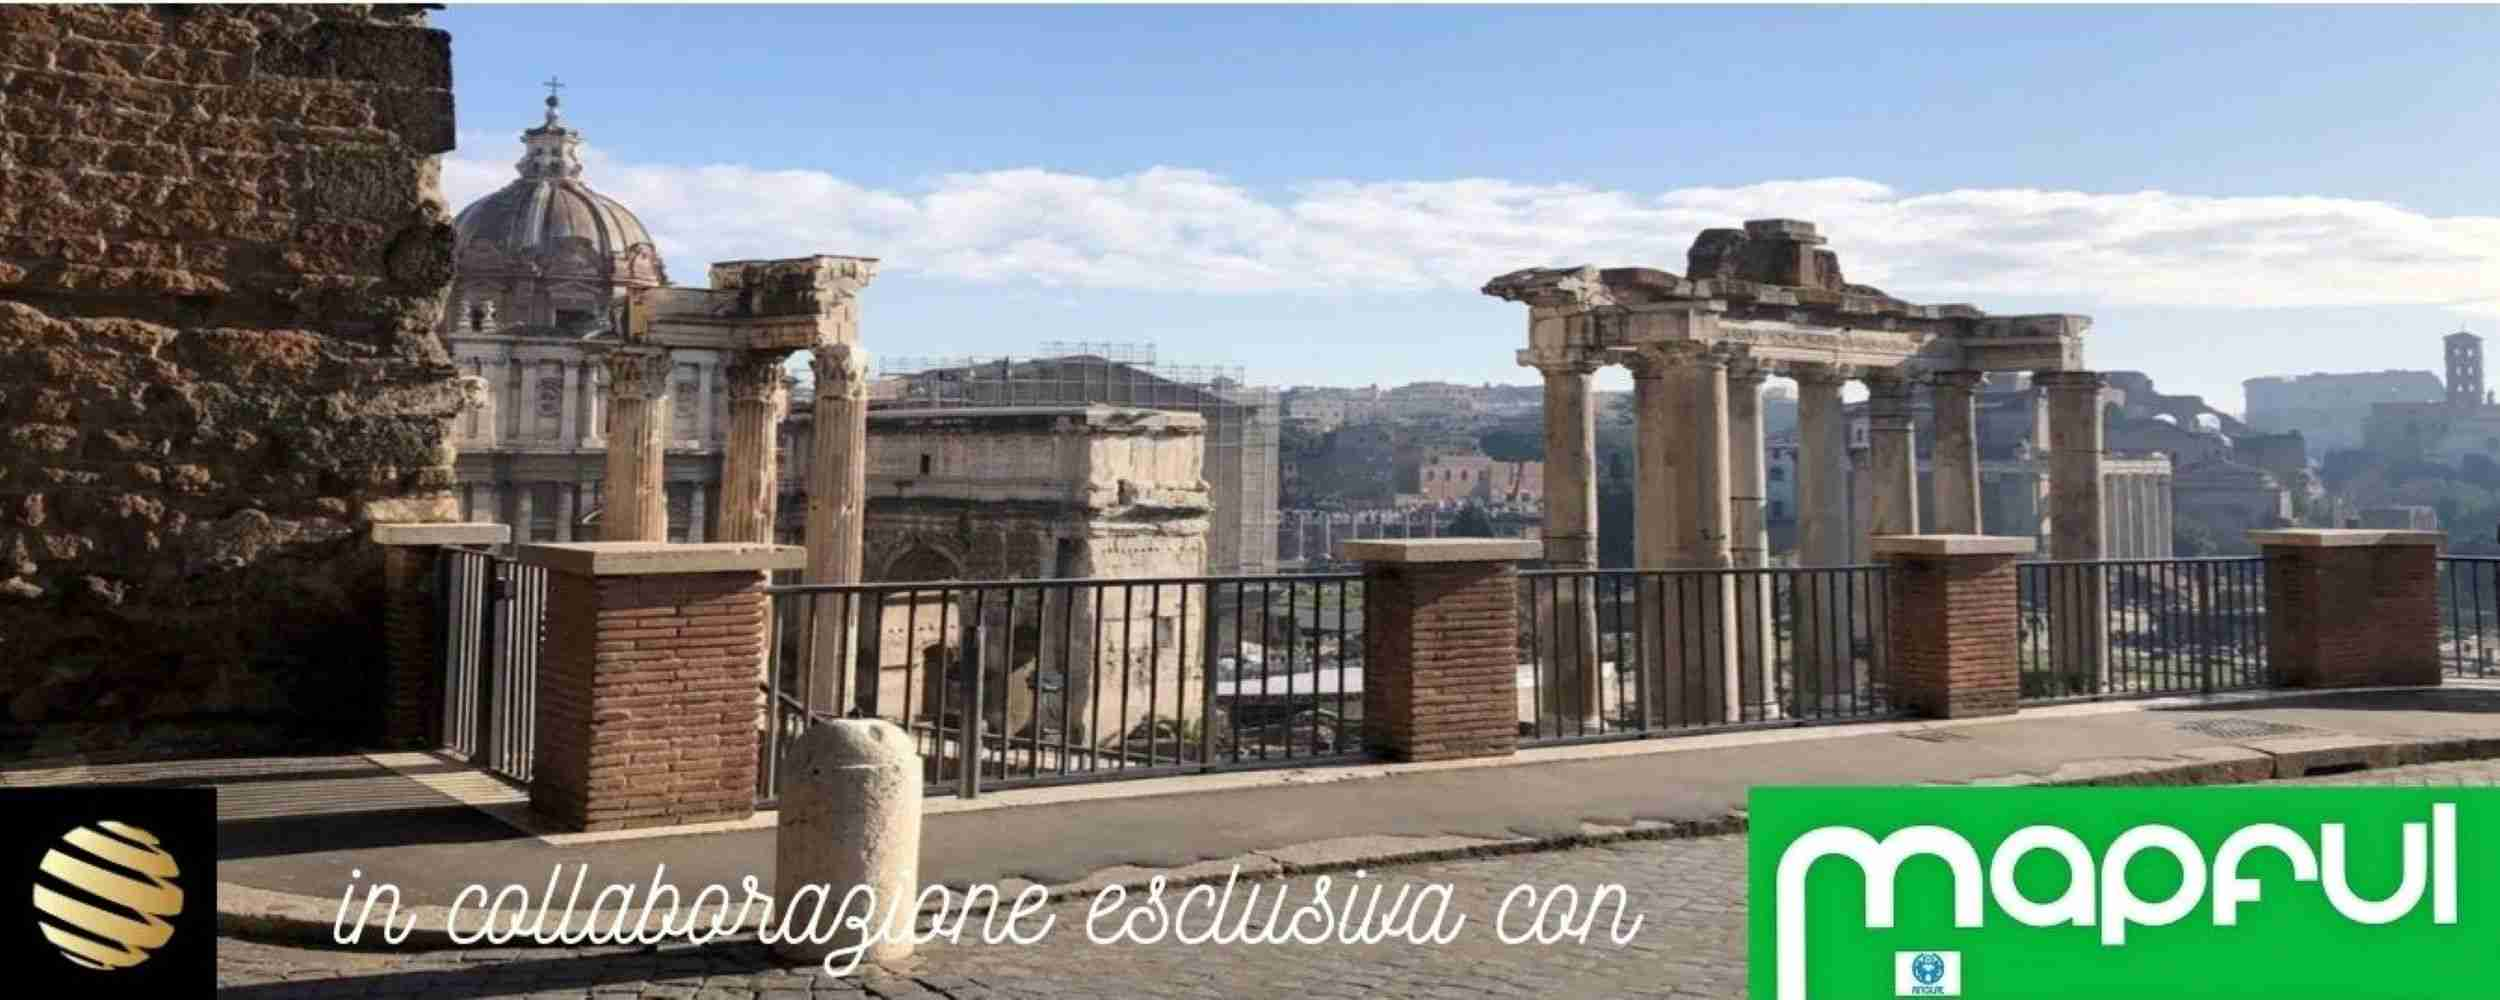 Visita guidata con tour Panoramico di Roma